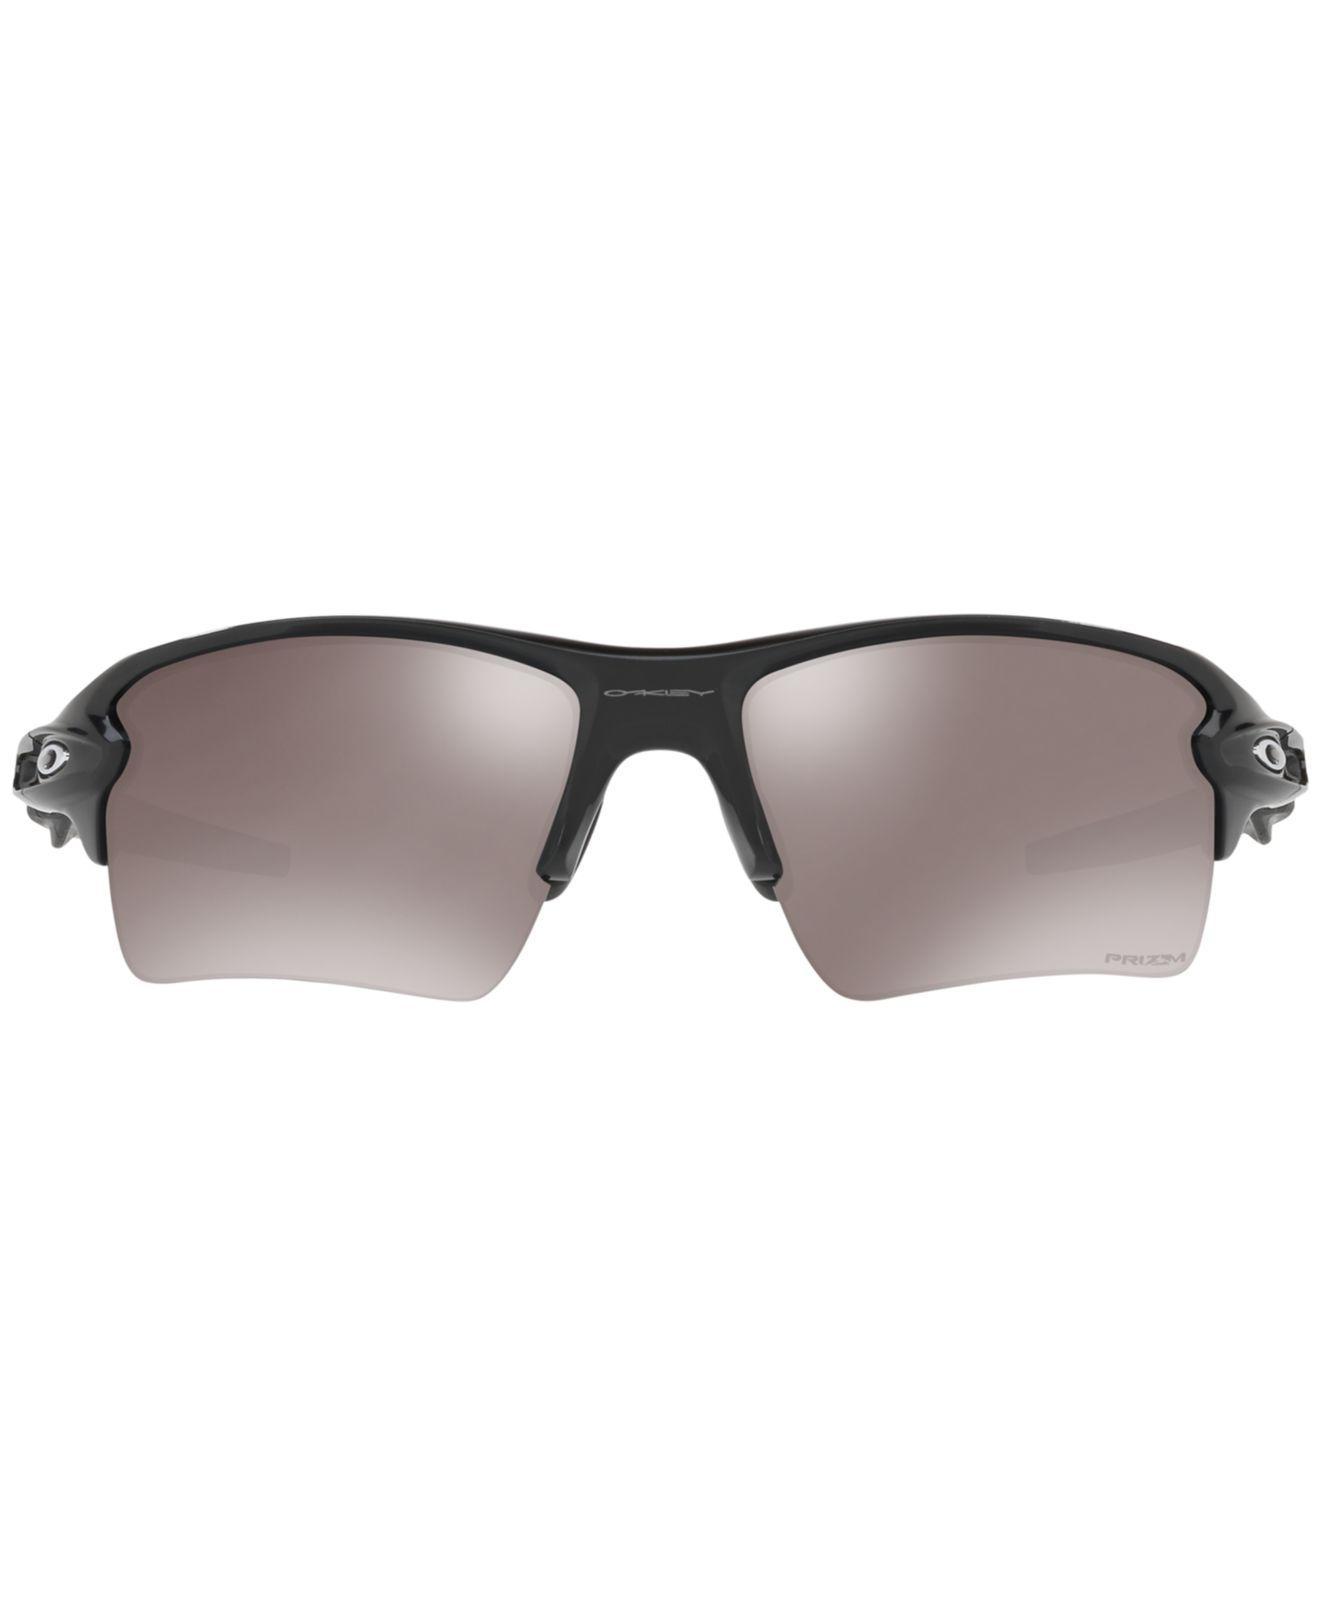 7a69b8e17b Lyst - Oakley Flak 2.0 Xl Sunglasses